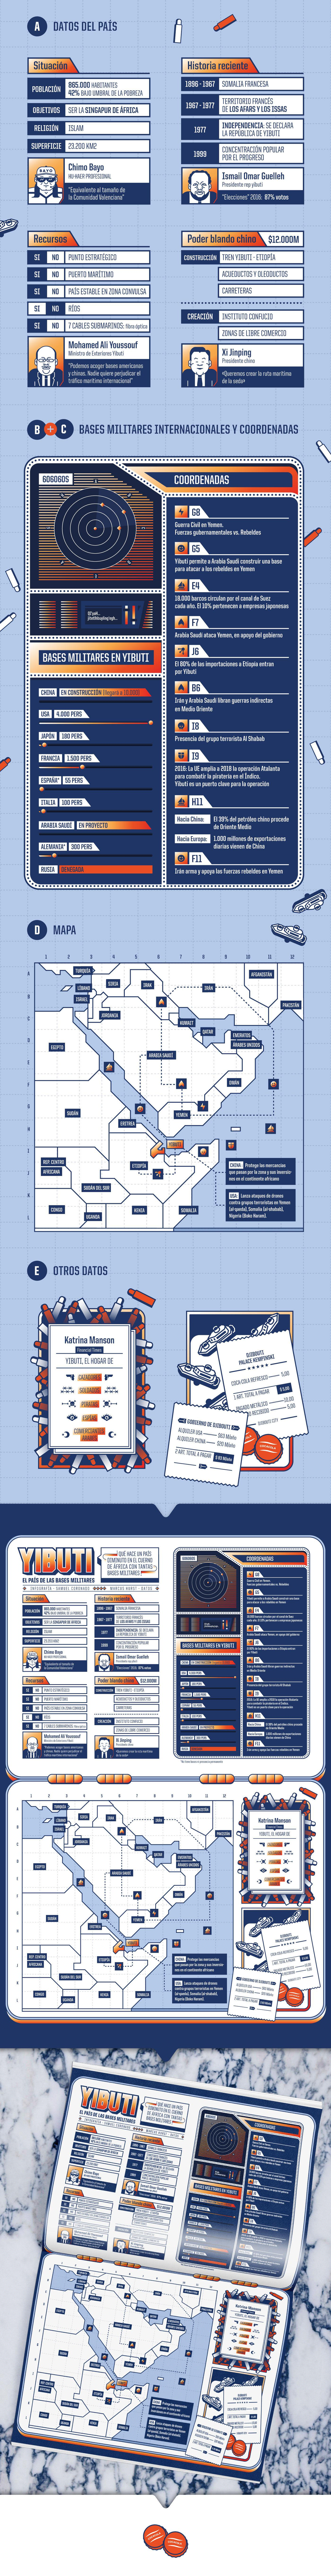 Djibouti yibuti infografia yorokobu infographics battleship game boat map